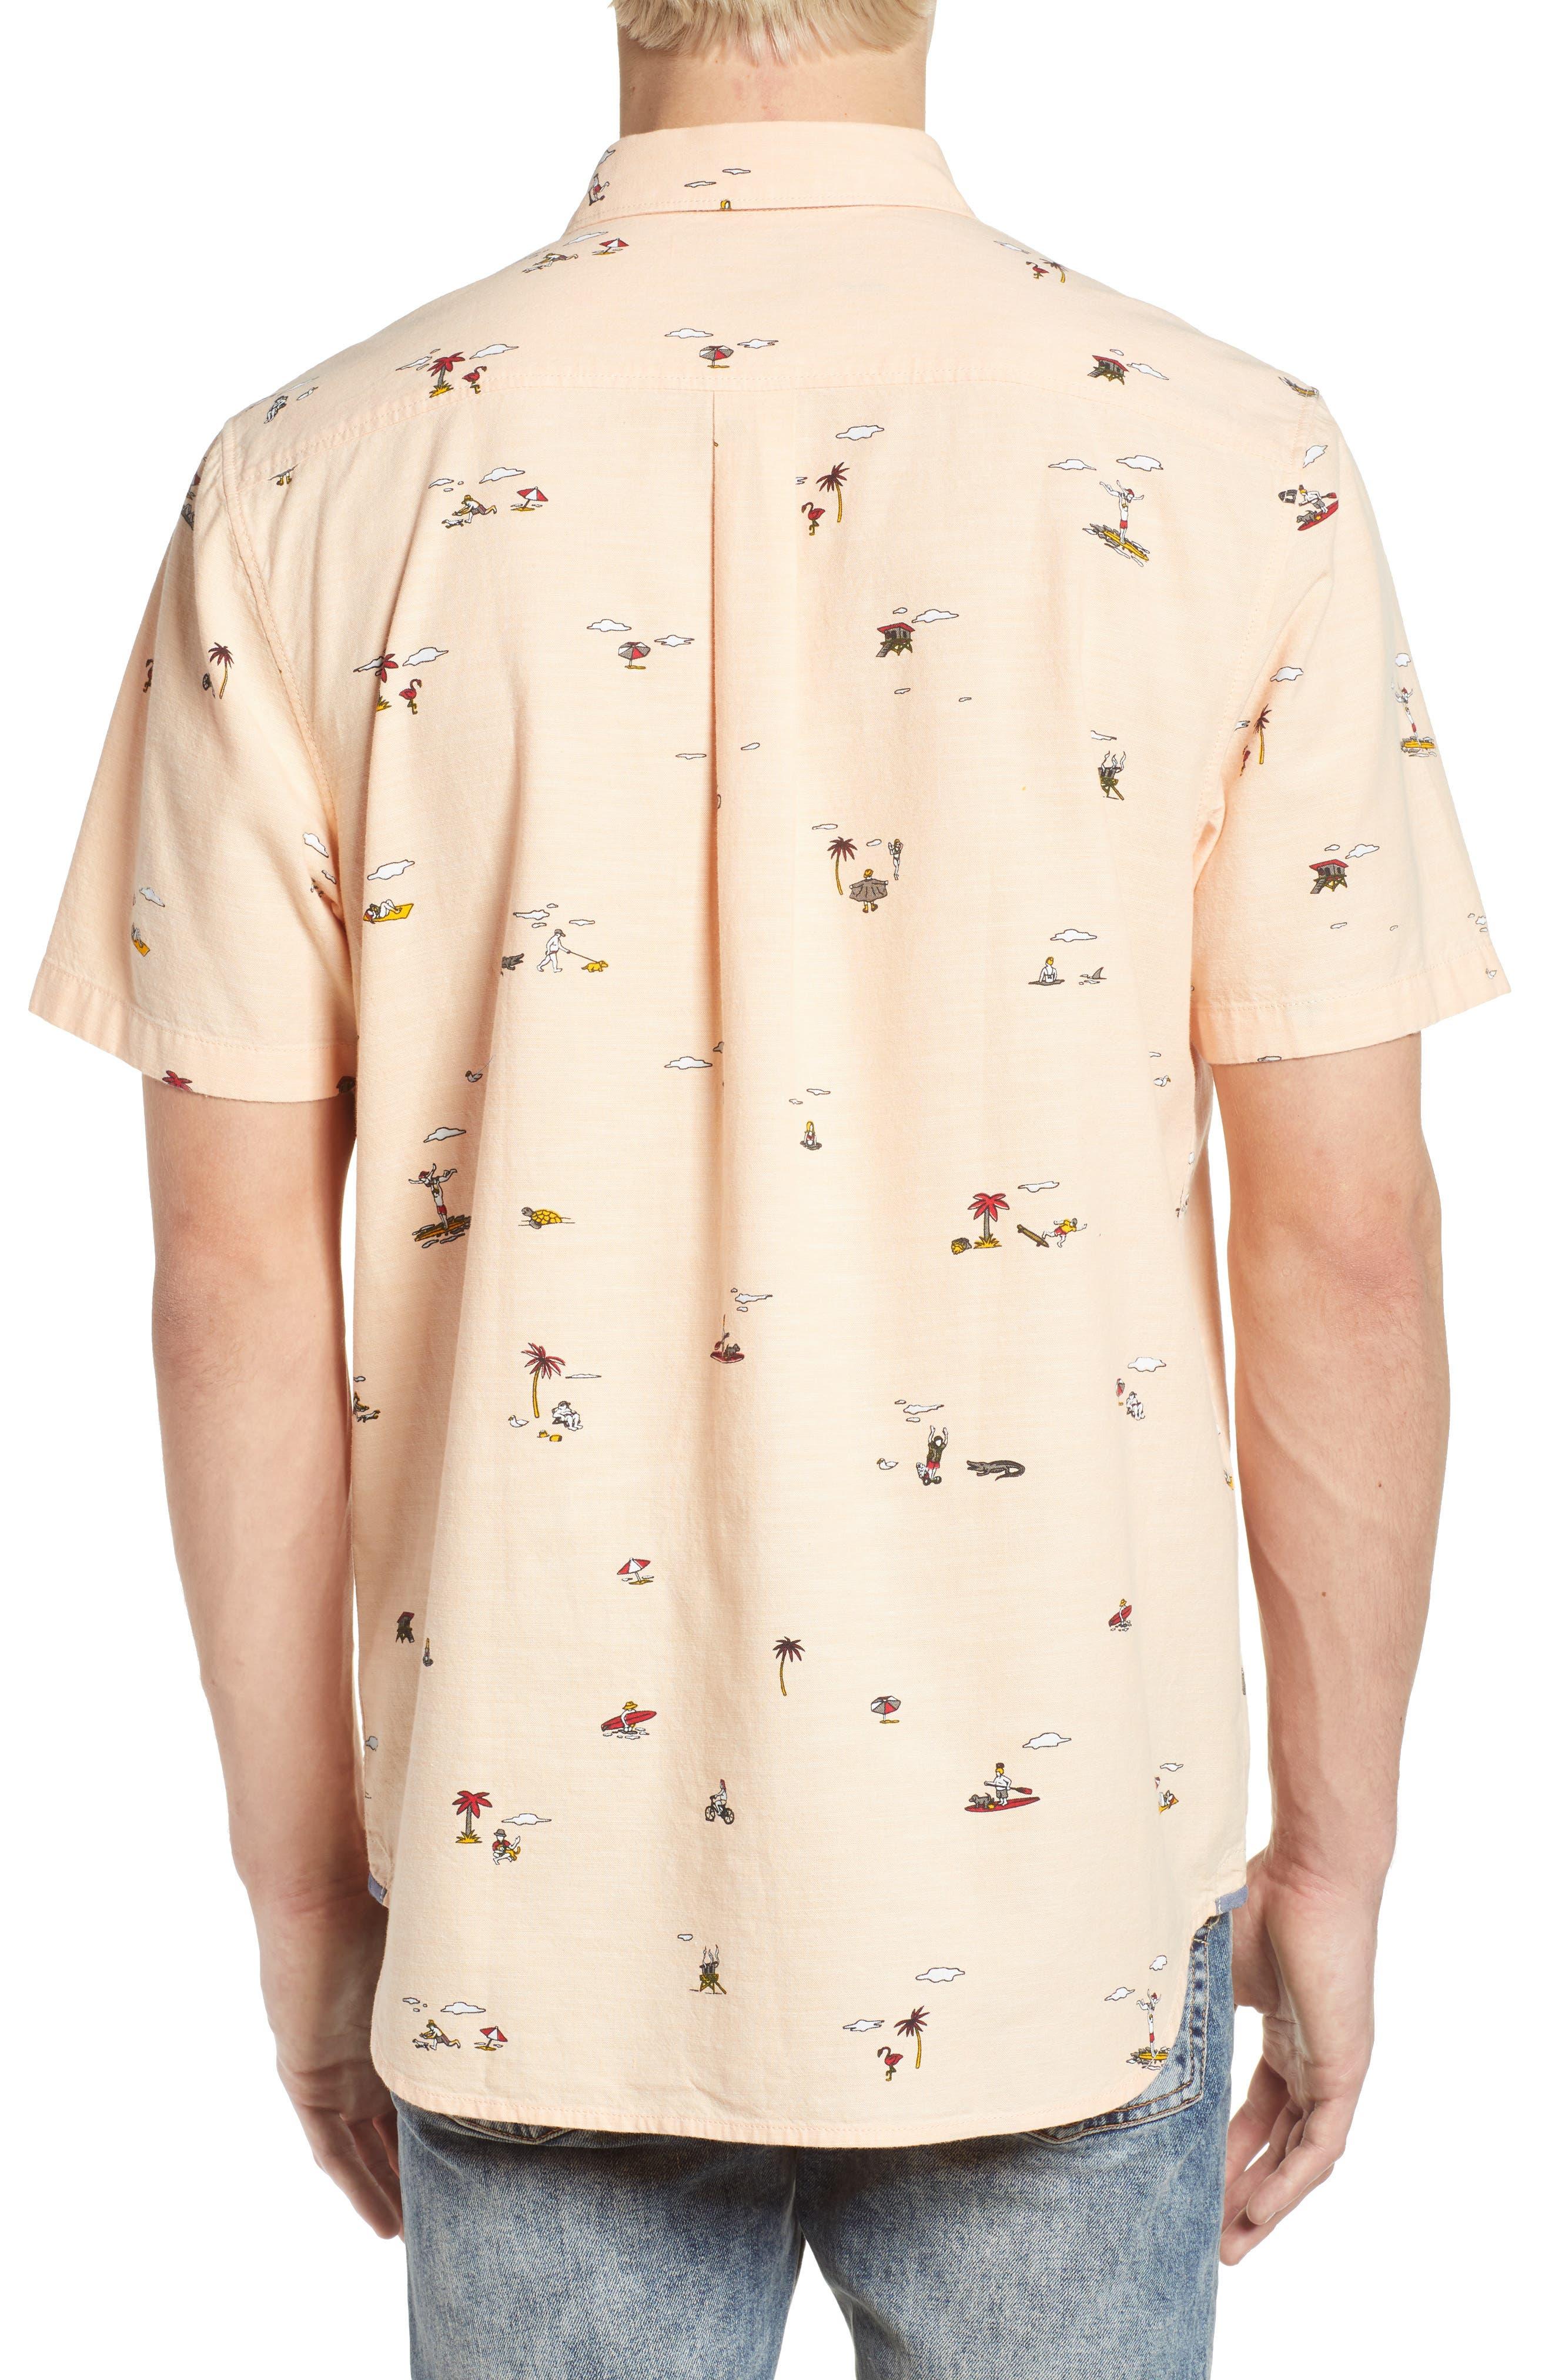 Tres Palmas Short Sleeve Shirt,                             Alternate thumbnail 2, color,                             Apricot Ice